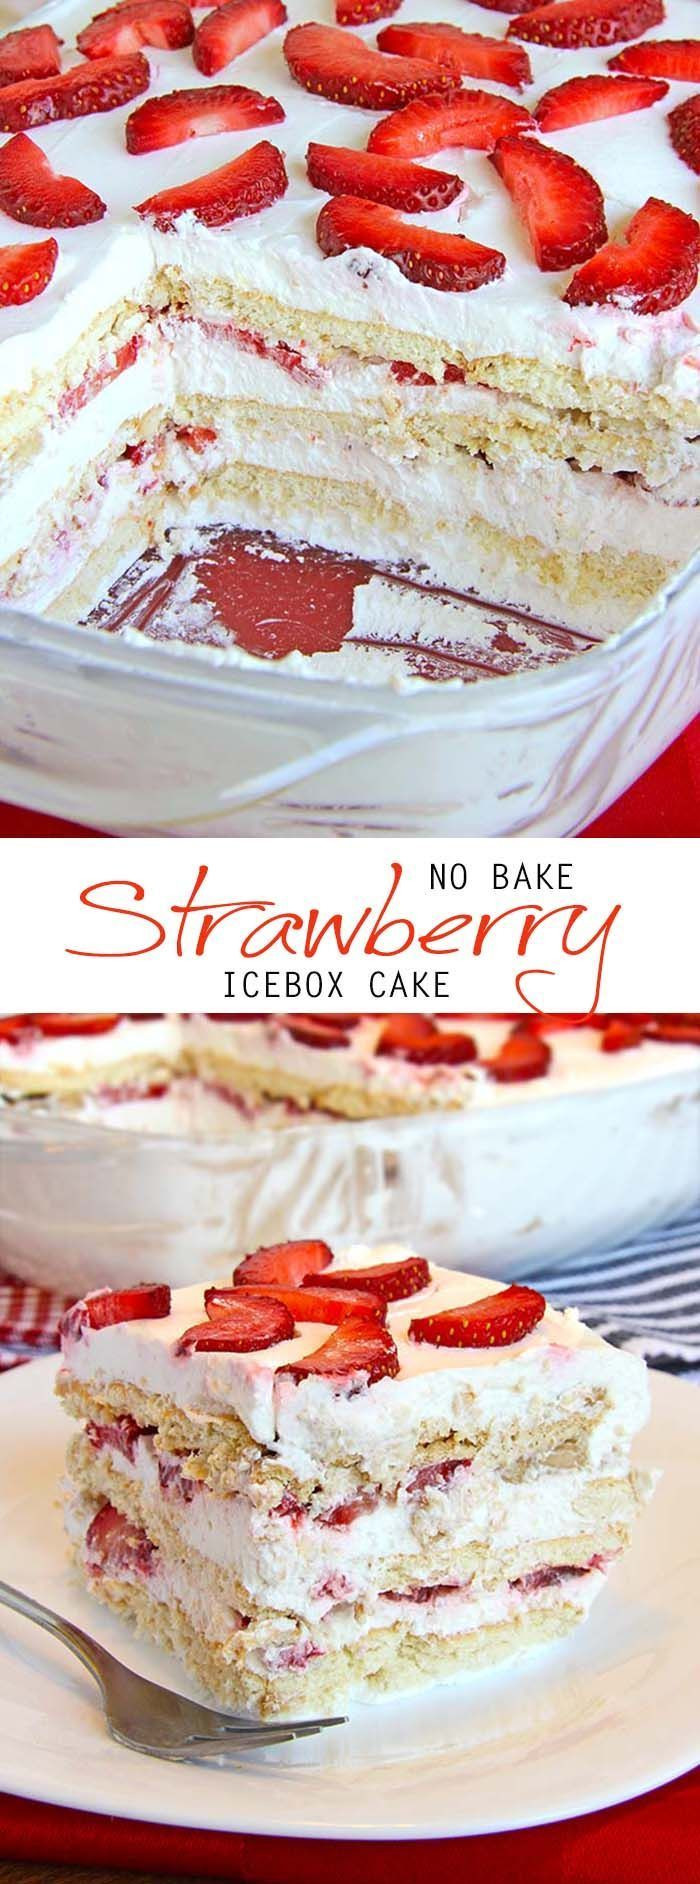 Quick Easy Summer Desserts  No Bake Strawberry Icebox Cake Recipe